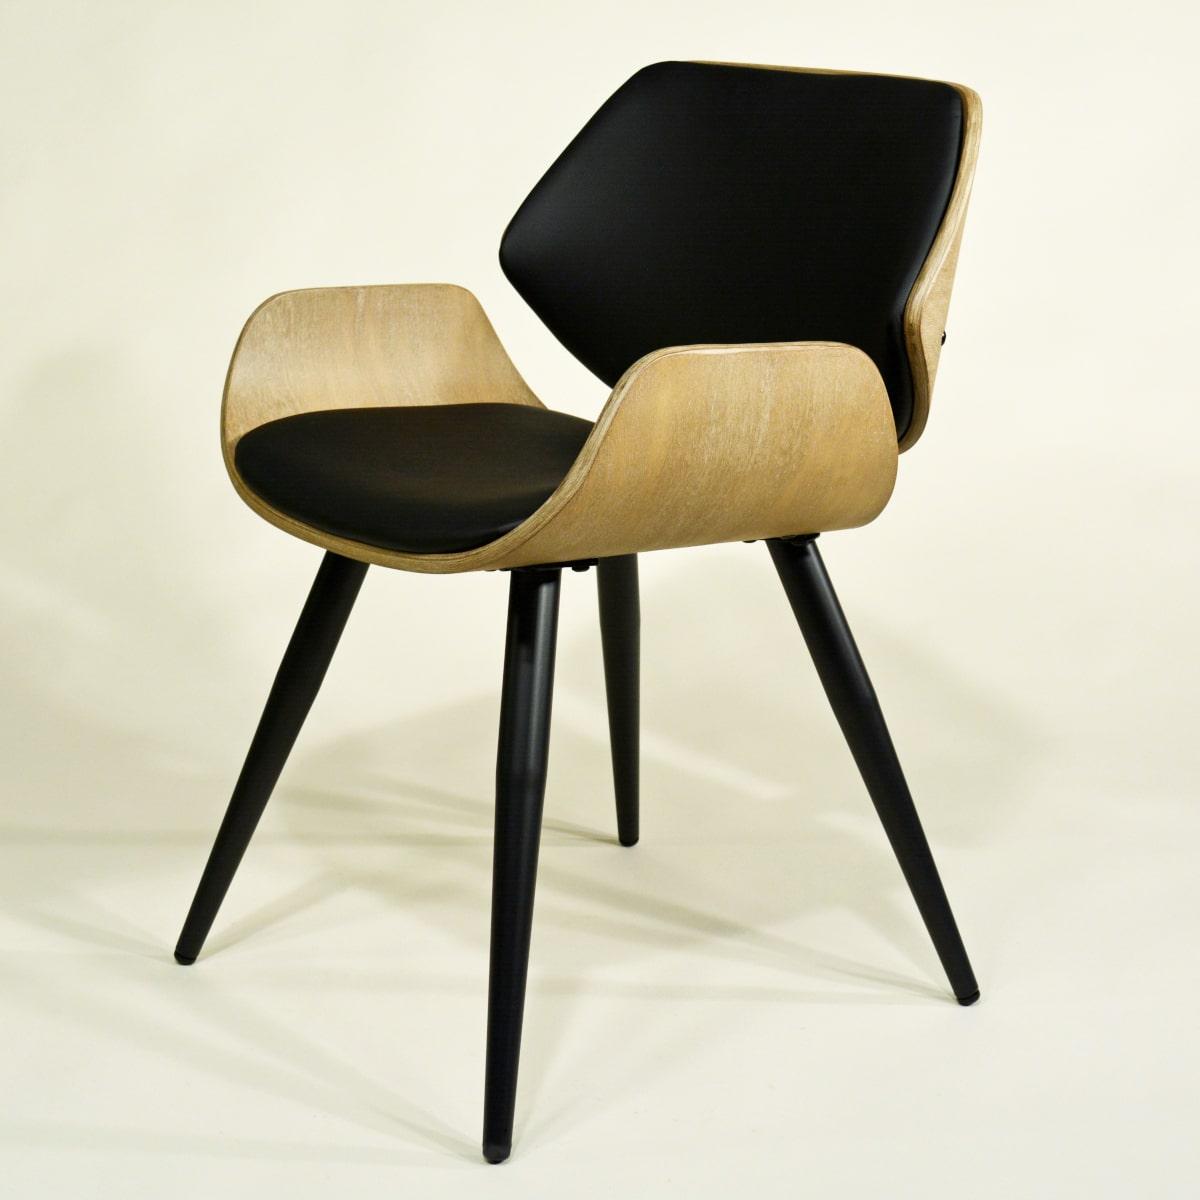 Design Esszimmerstuhl Holz Plywood